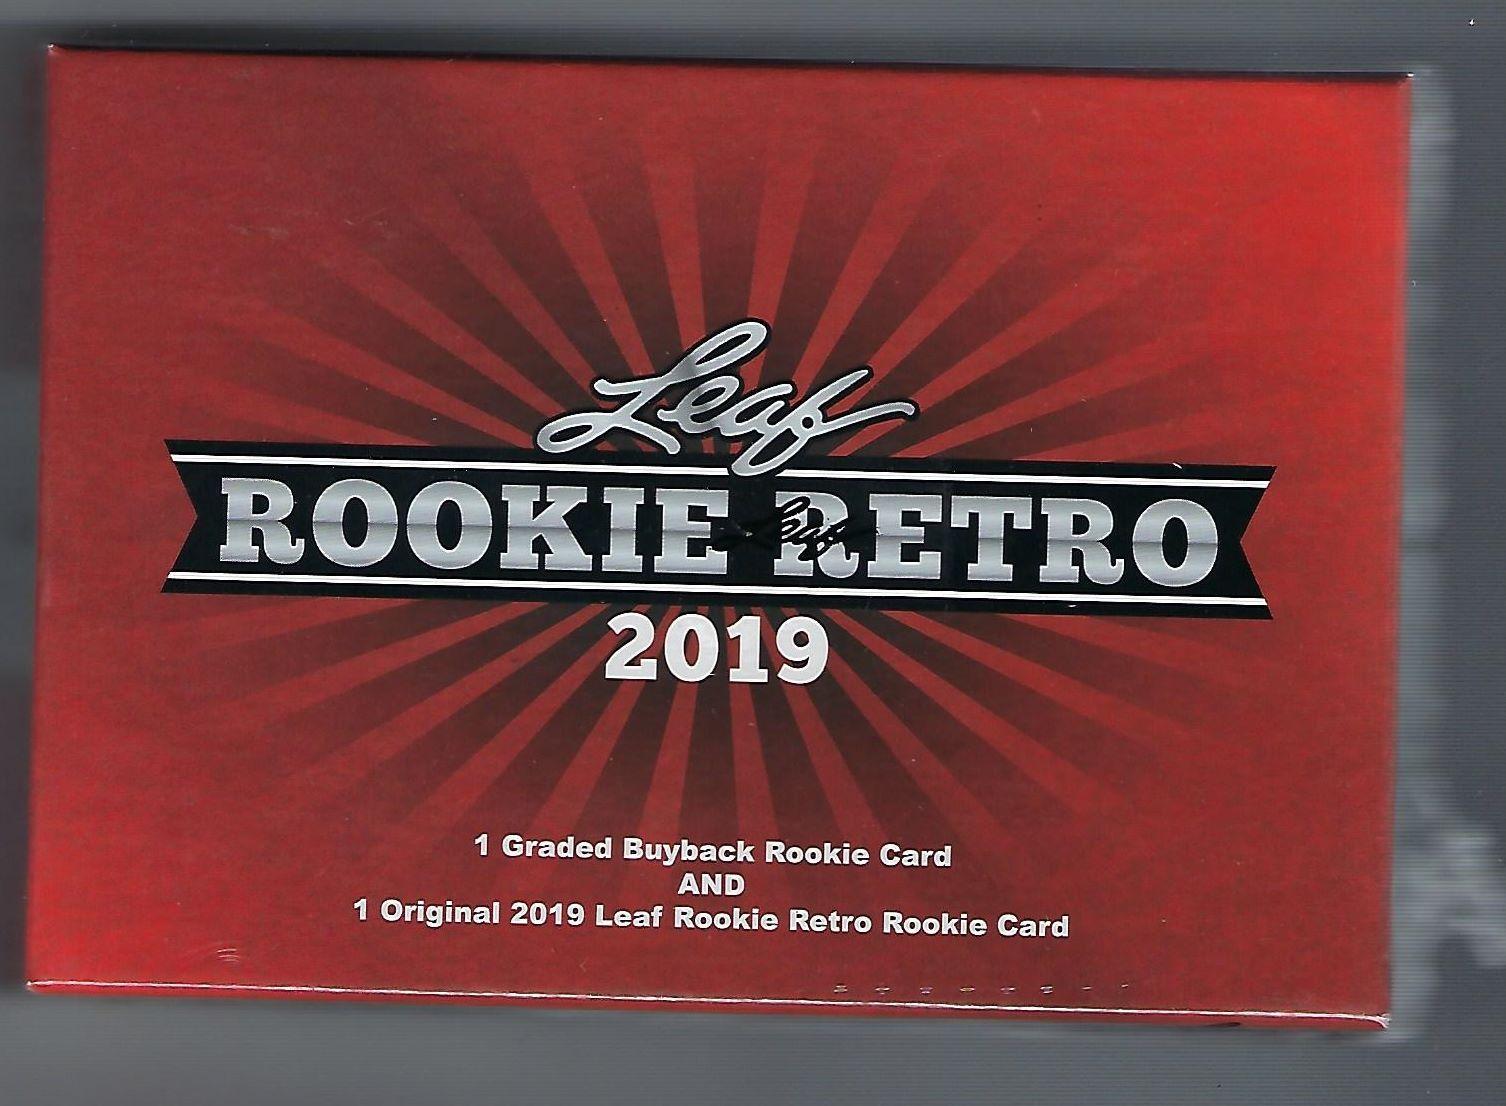 2019 Leaf Rookie Retro Hobby Box